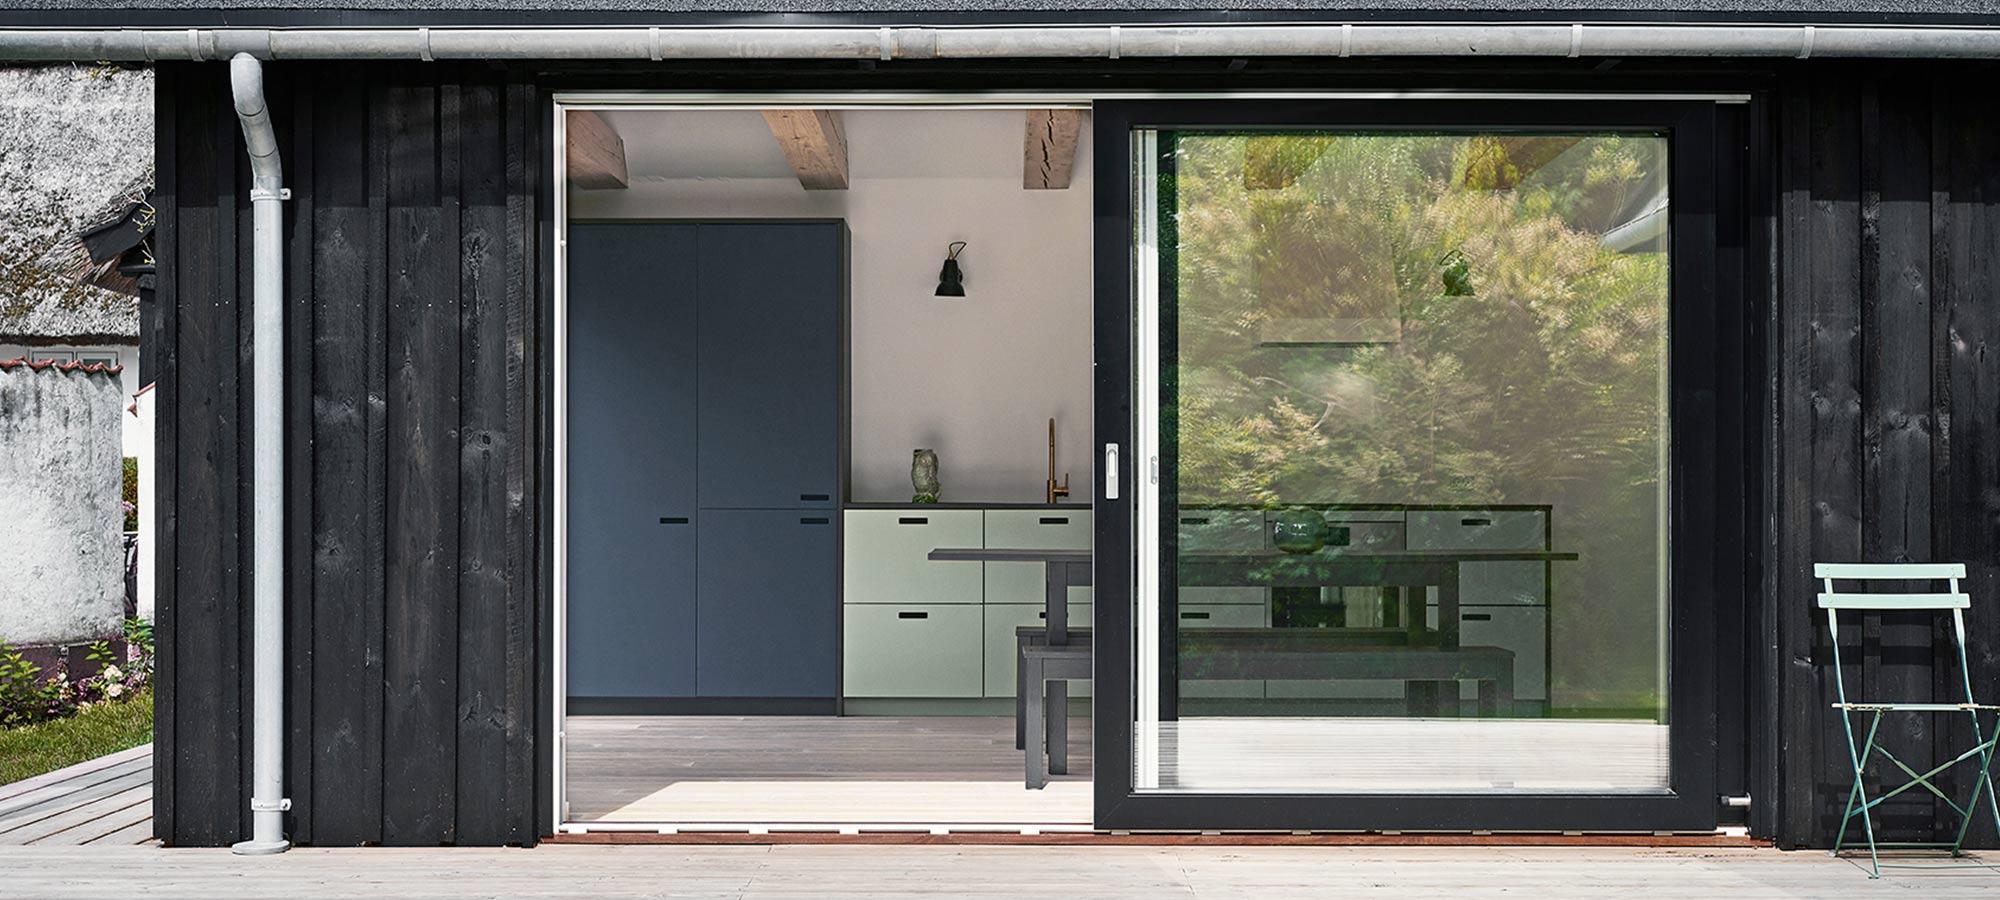 ikeahack-kitchen-fronts-låger-til-ikea-&SHUFL-andshufl-linoleum-fronter-køkken-pistacio-smokeyblue